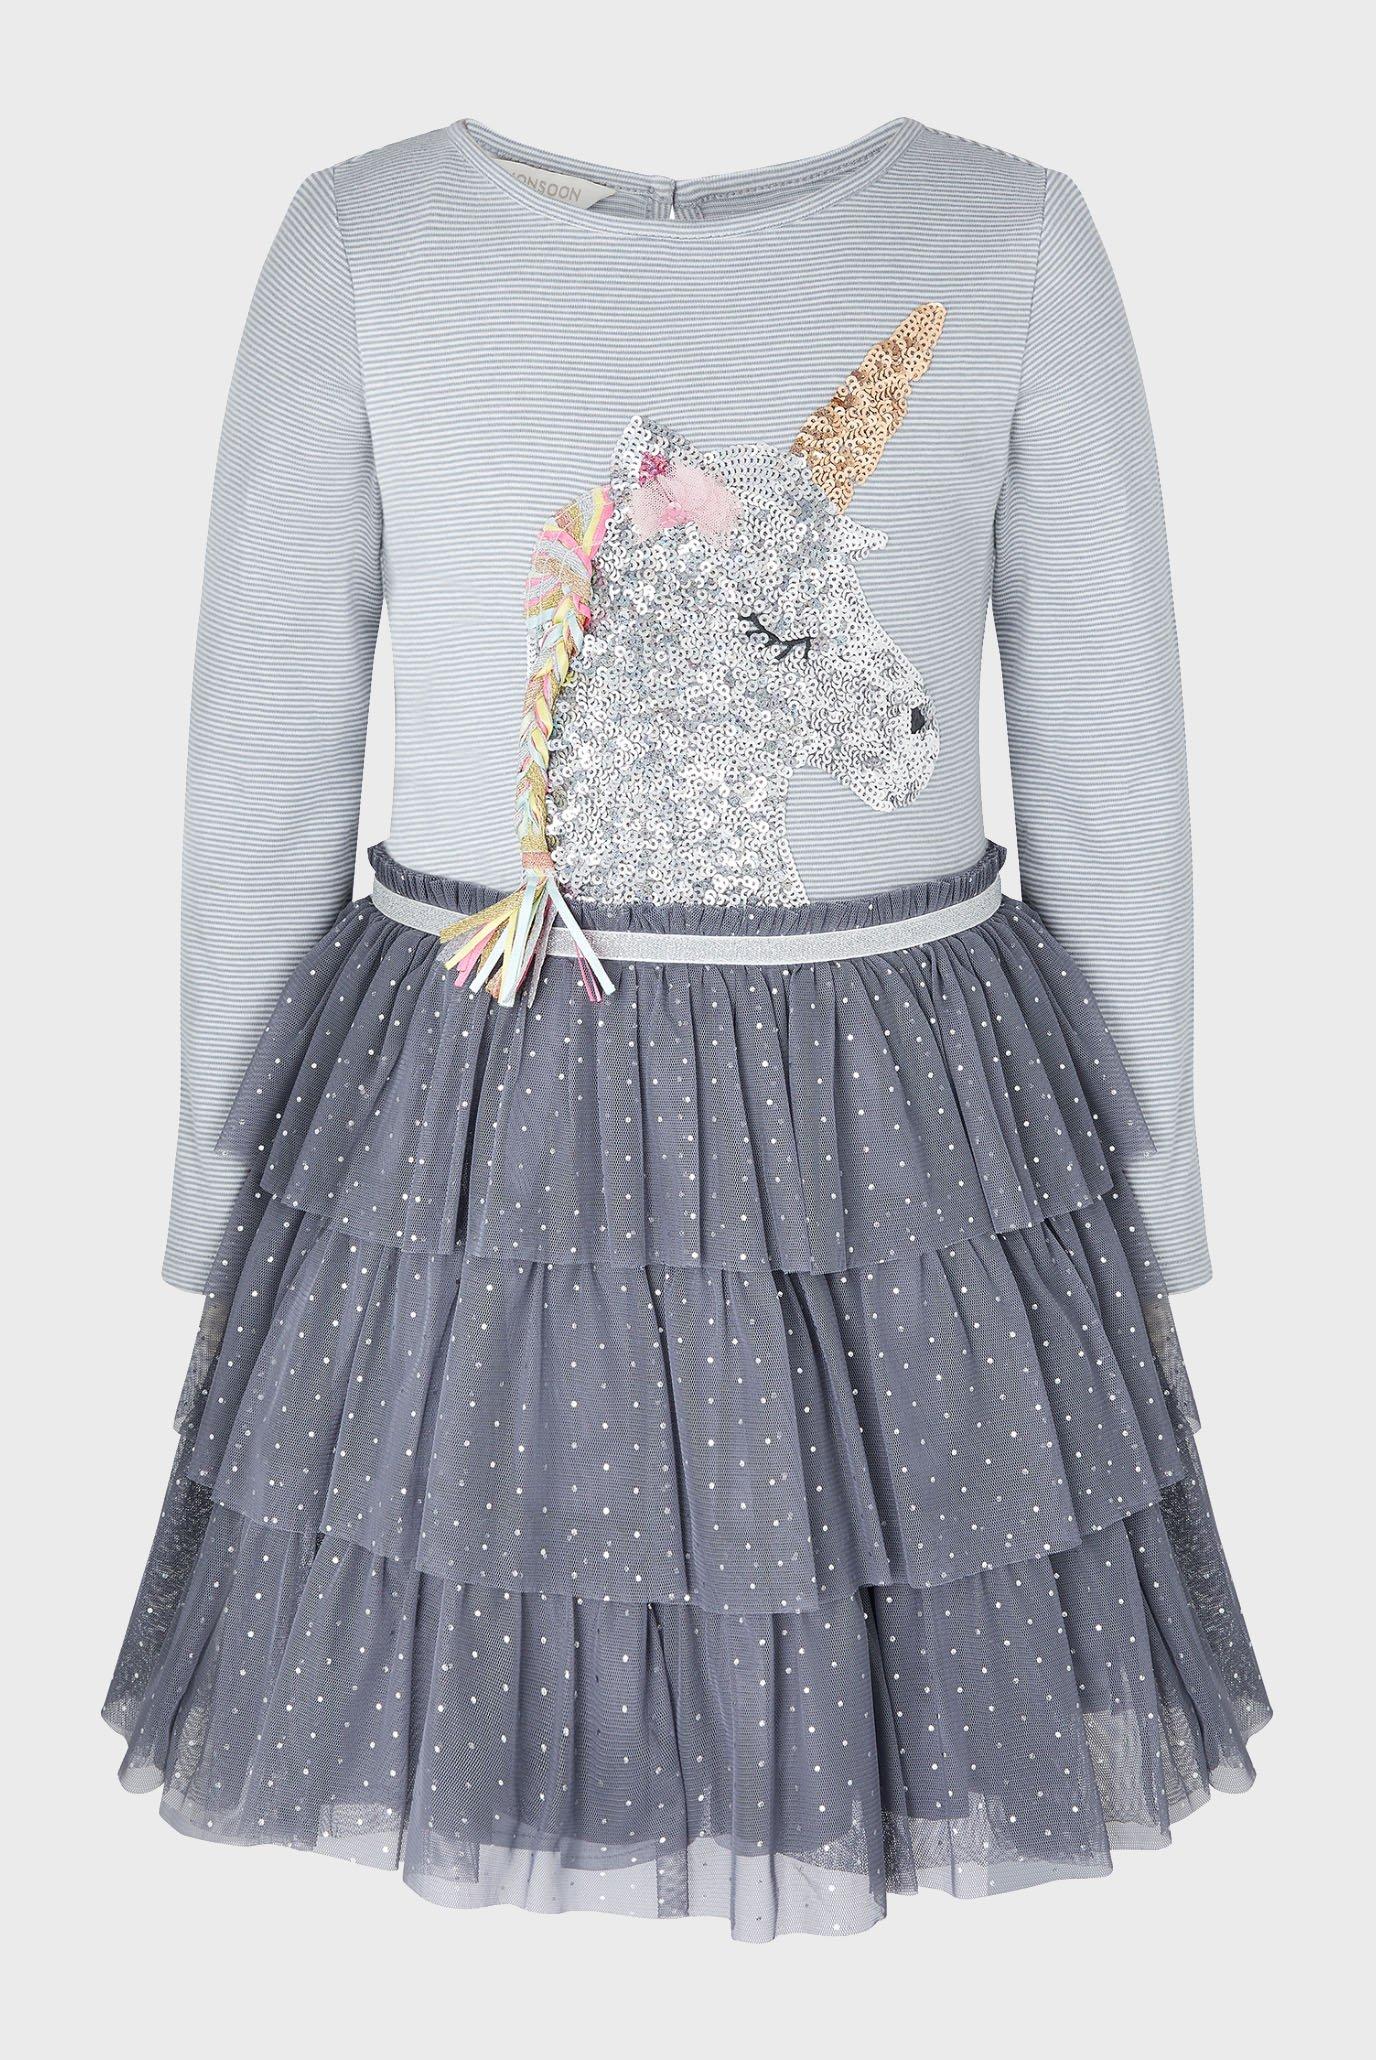 Дитяча сіра сукня SEQUIN UNICORN DRESS 1